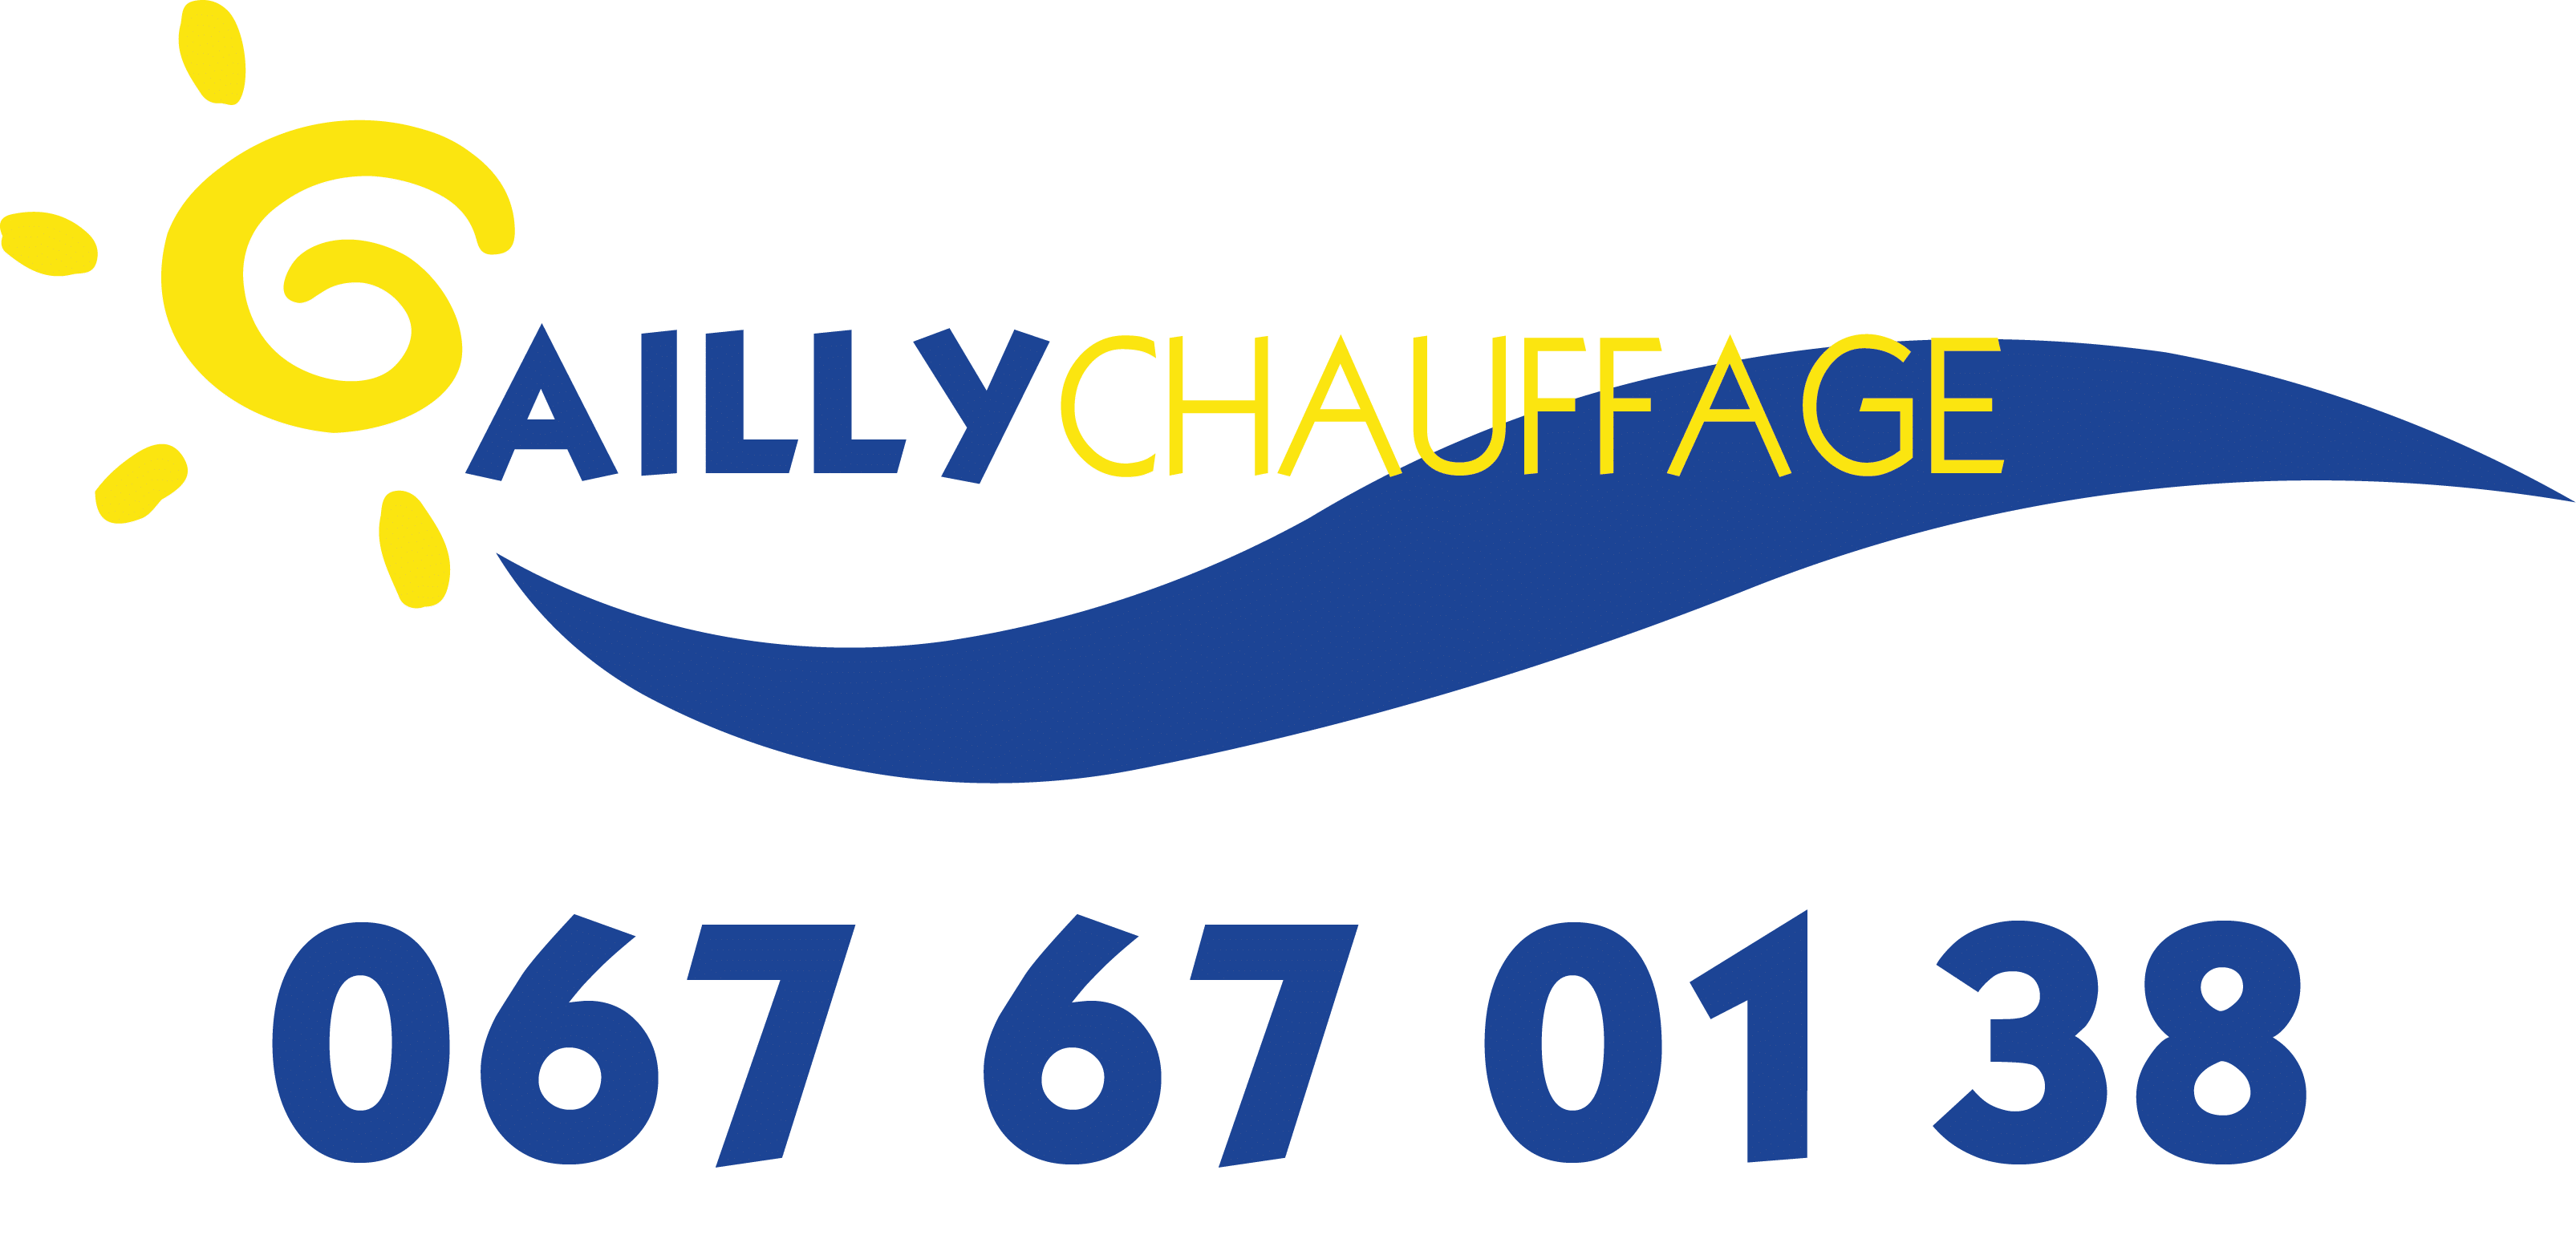 Votre plombier & chauffagiste – Gailly Chauffage